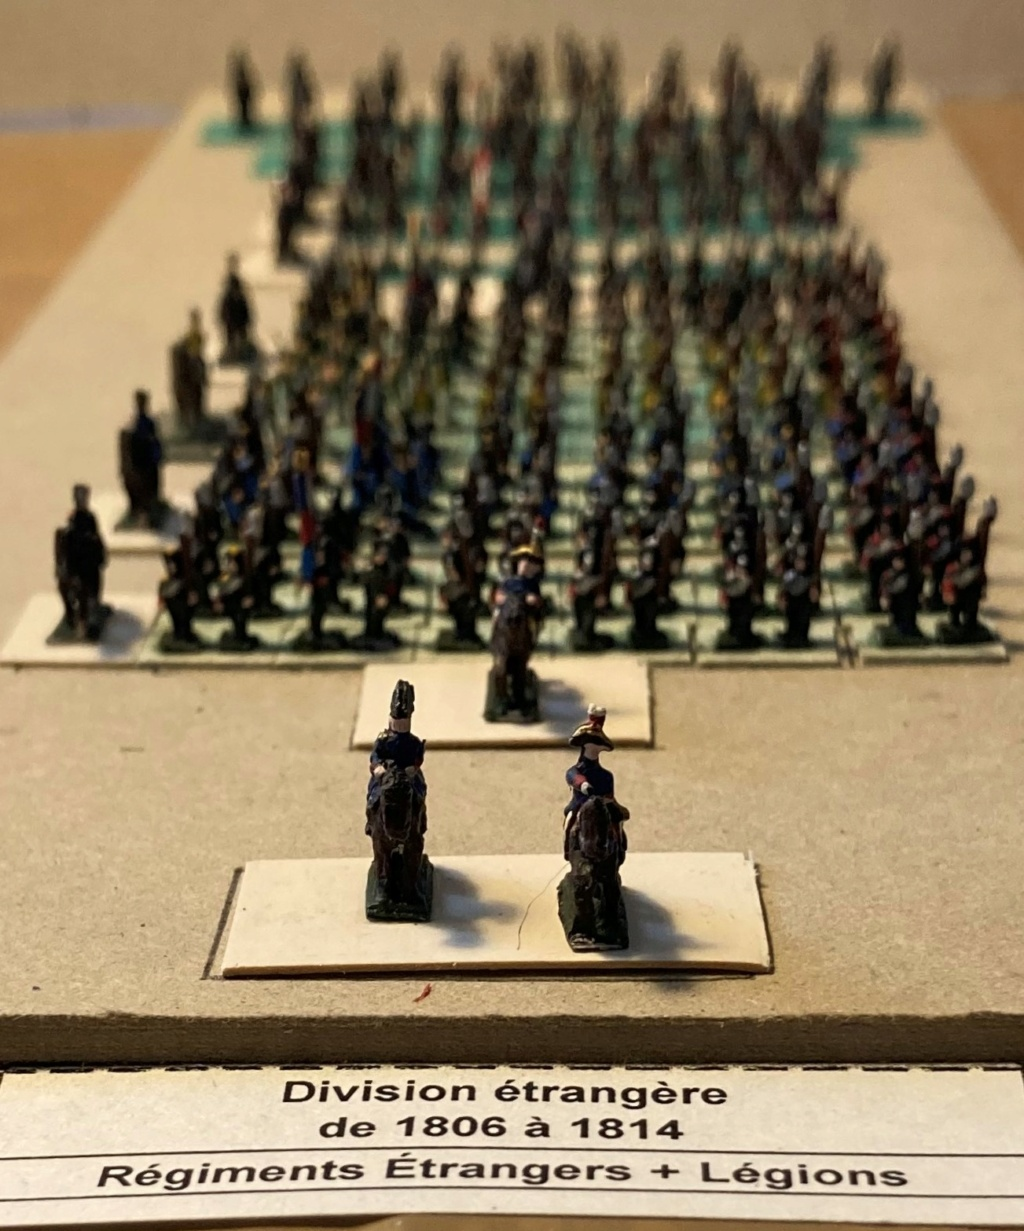 I° Empire : Division regroupant 1 Brigade de 4 Régiments étrangers au Service de France + 1 Brigade de 3 Légions au Service de France (Au 1/300°). 11-110